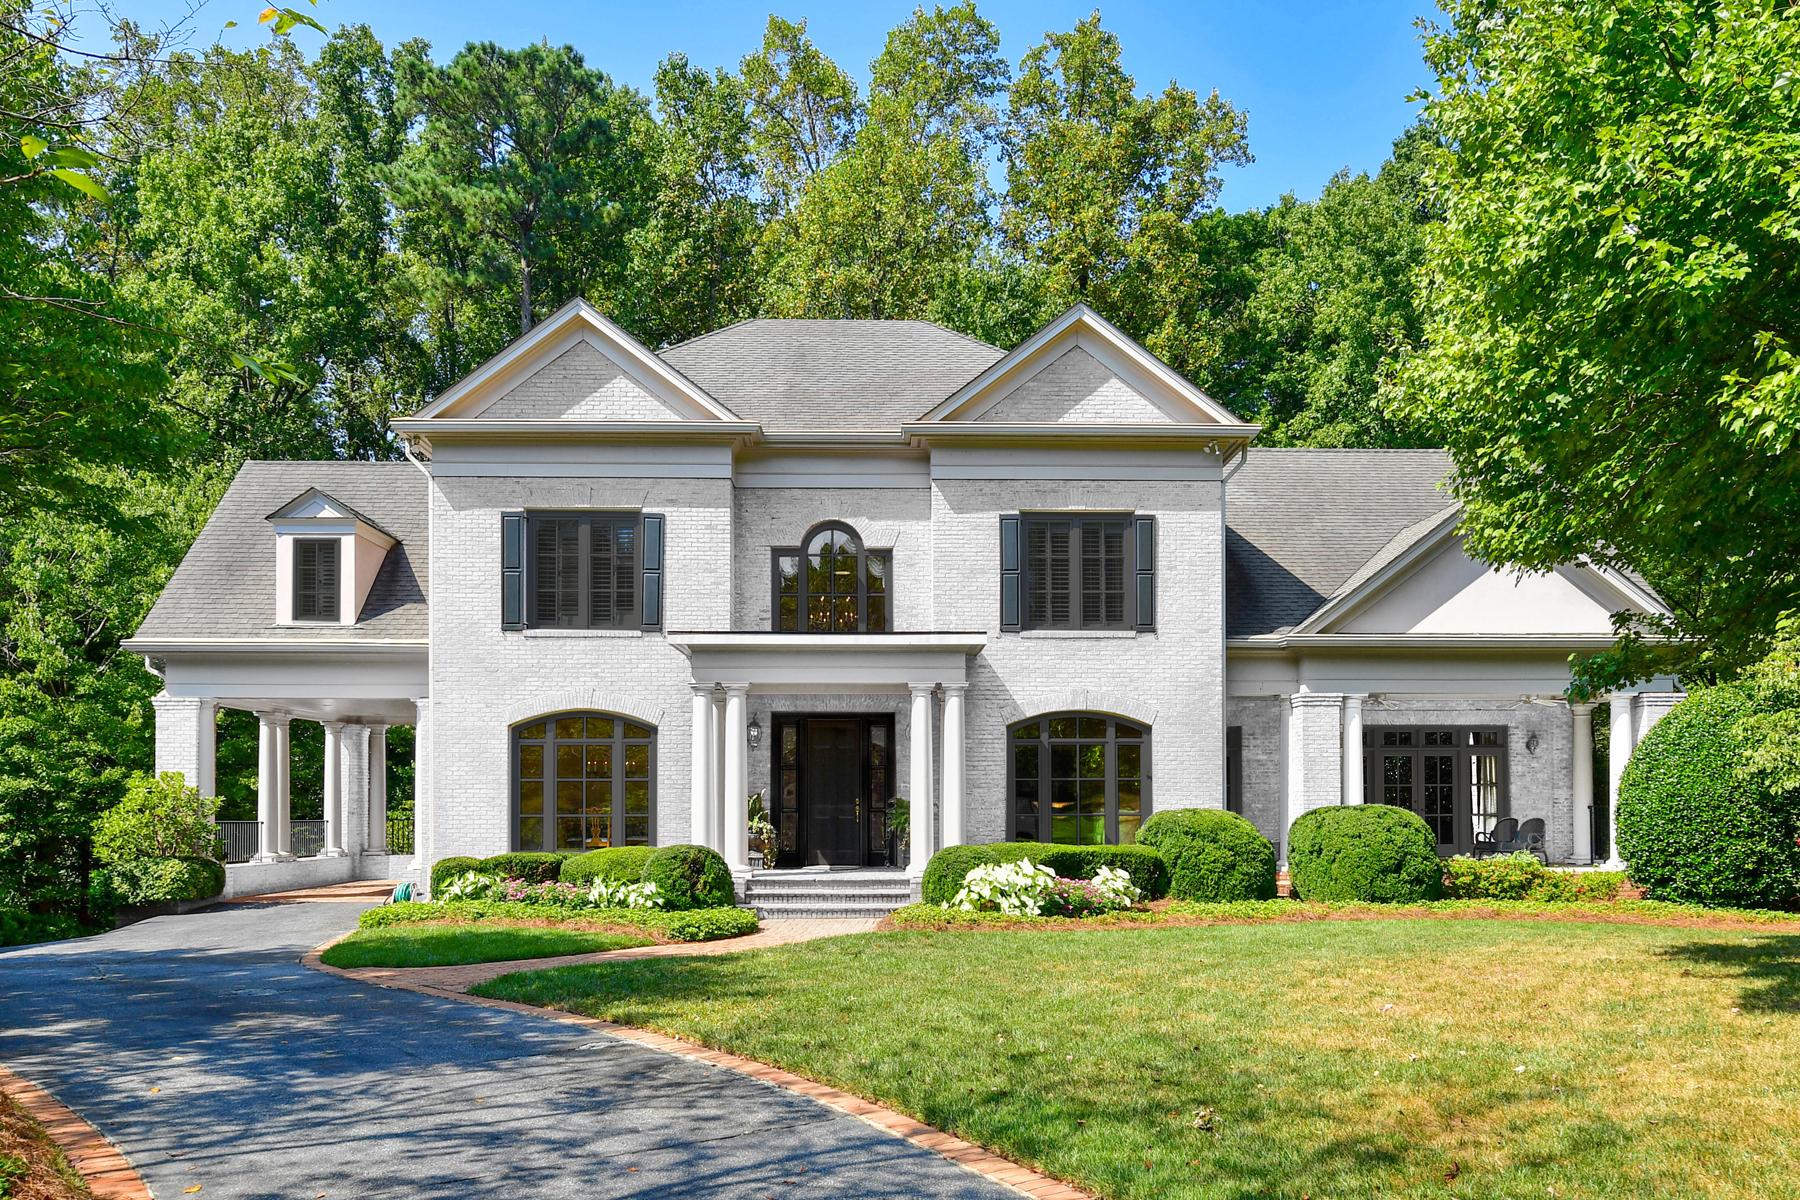 Single Family Homes pour l Vente à Stunning Brick Traditional on a Favorite Historic Brookhaven Cul-de-sac 4338 Town Commons Circle NE, Atlanta, Georgia 30319 États-Unis